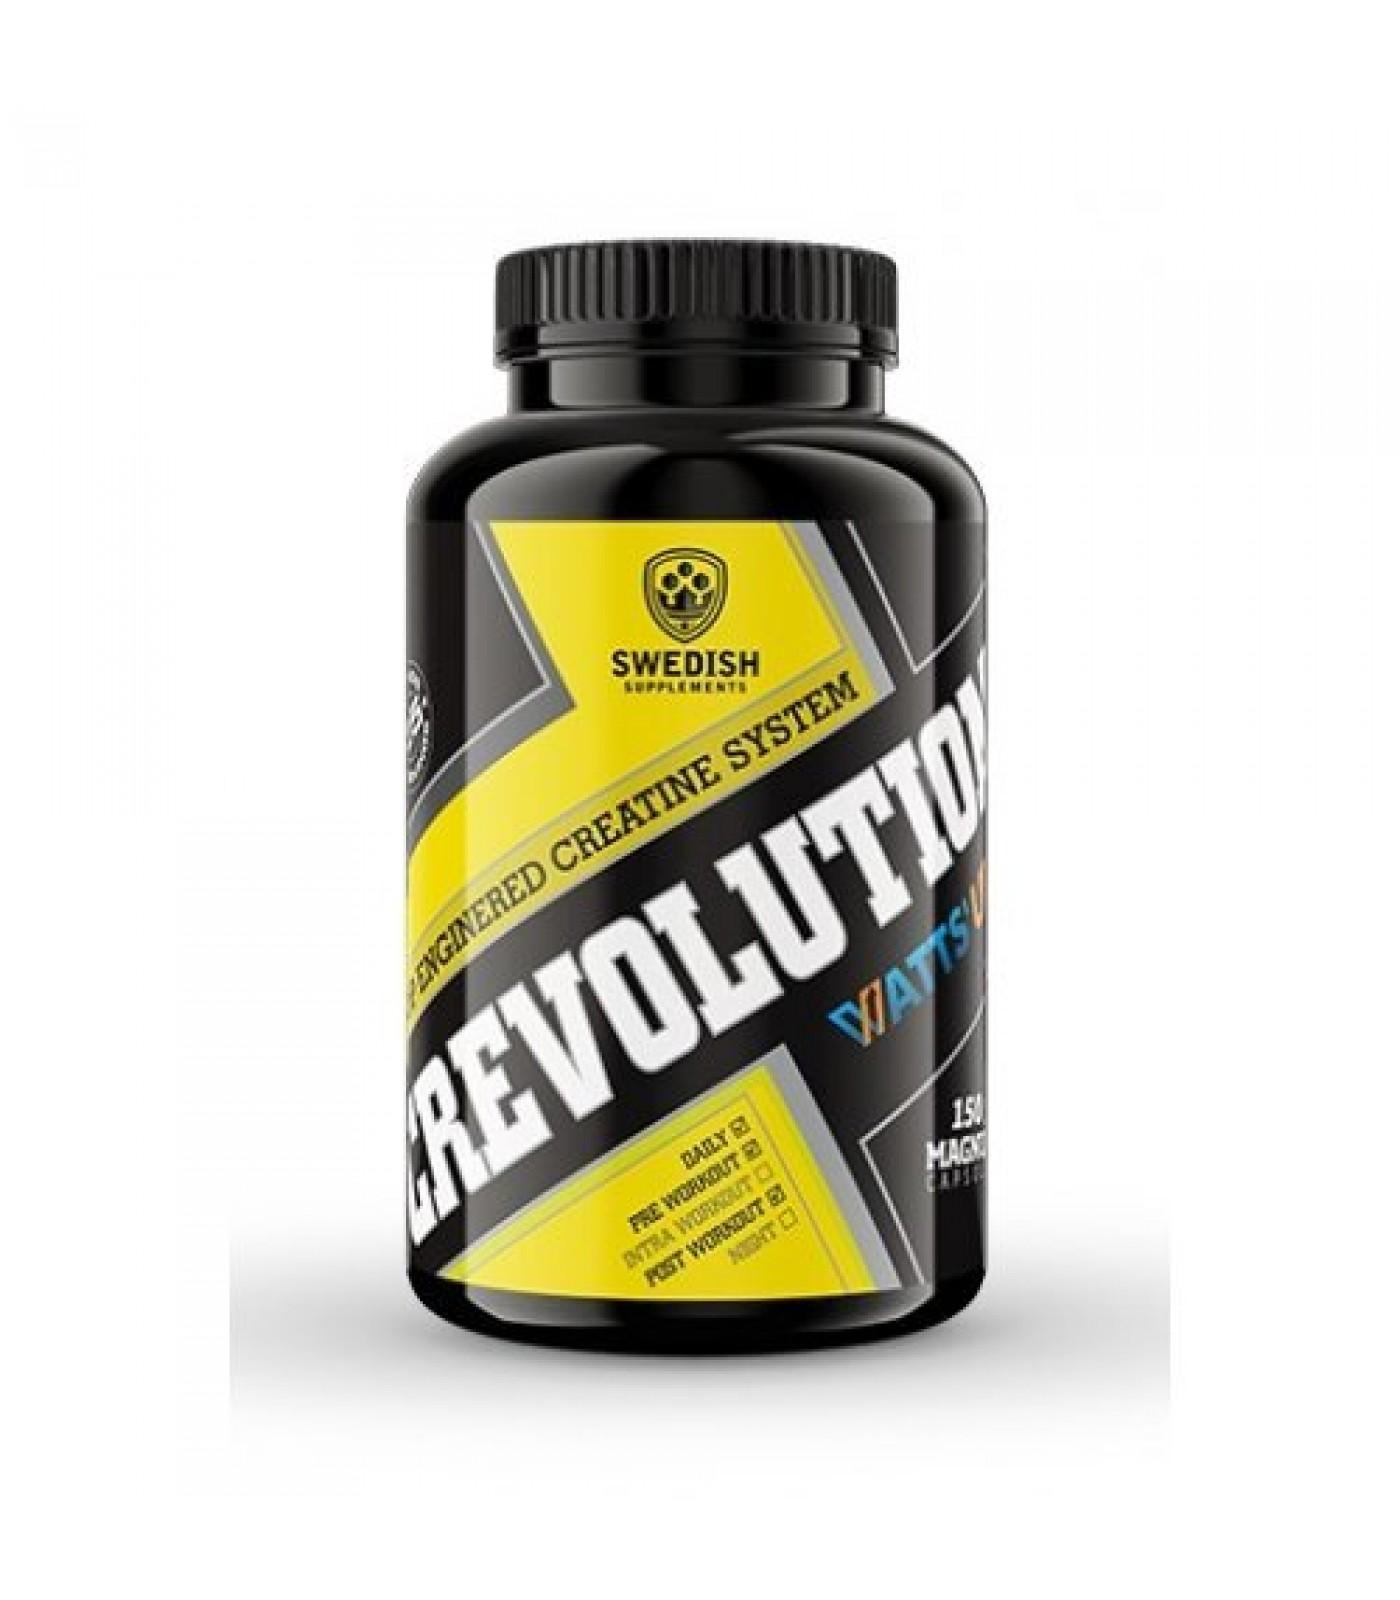 SWEDISH Supplements - CREVOLUTION Caps